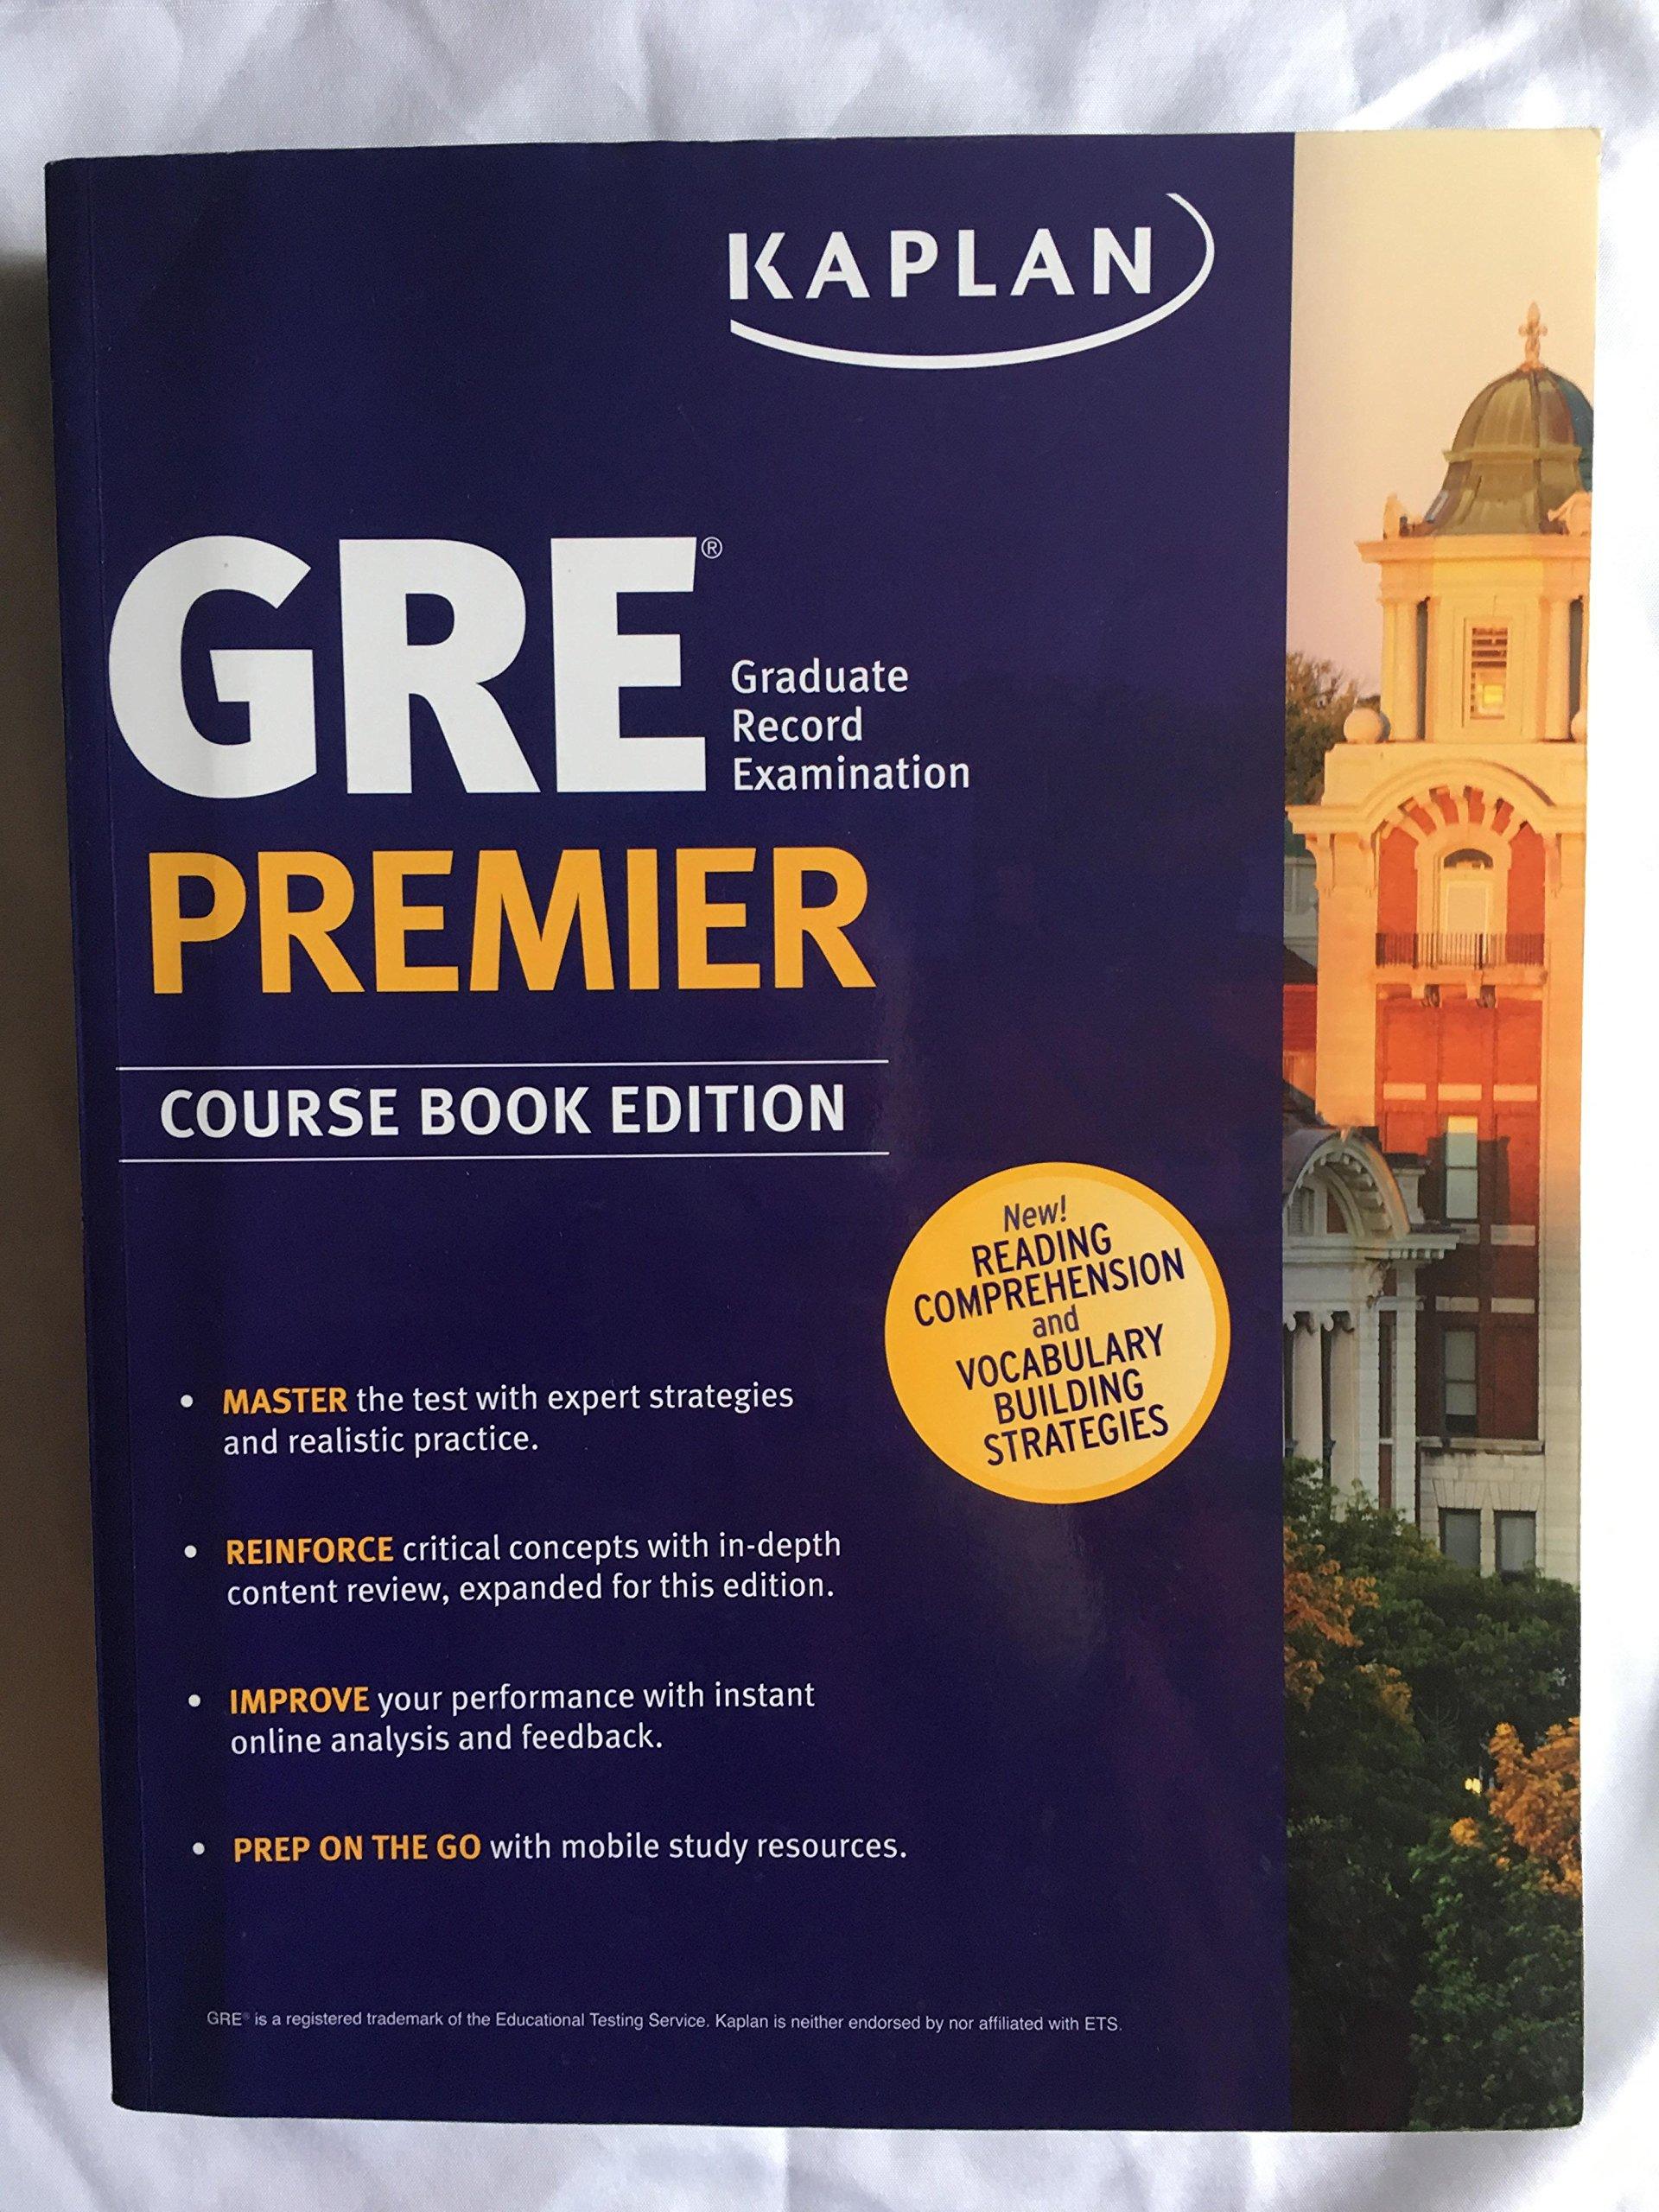 Kaplan GRE Premier Course Book Edition: Kaplan Test Prep: 9781506207070:  Amazon.com: Books